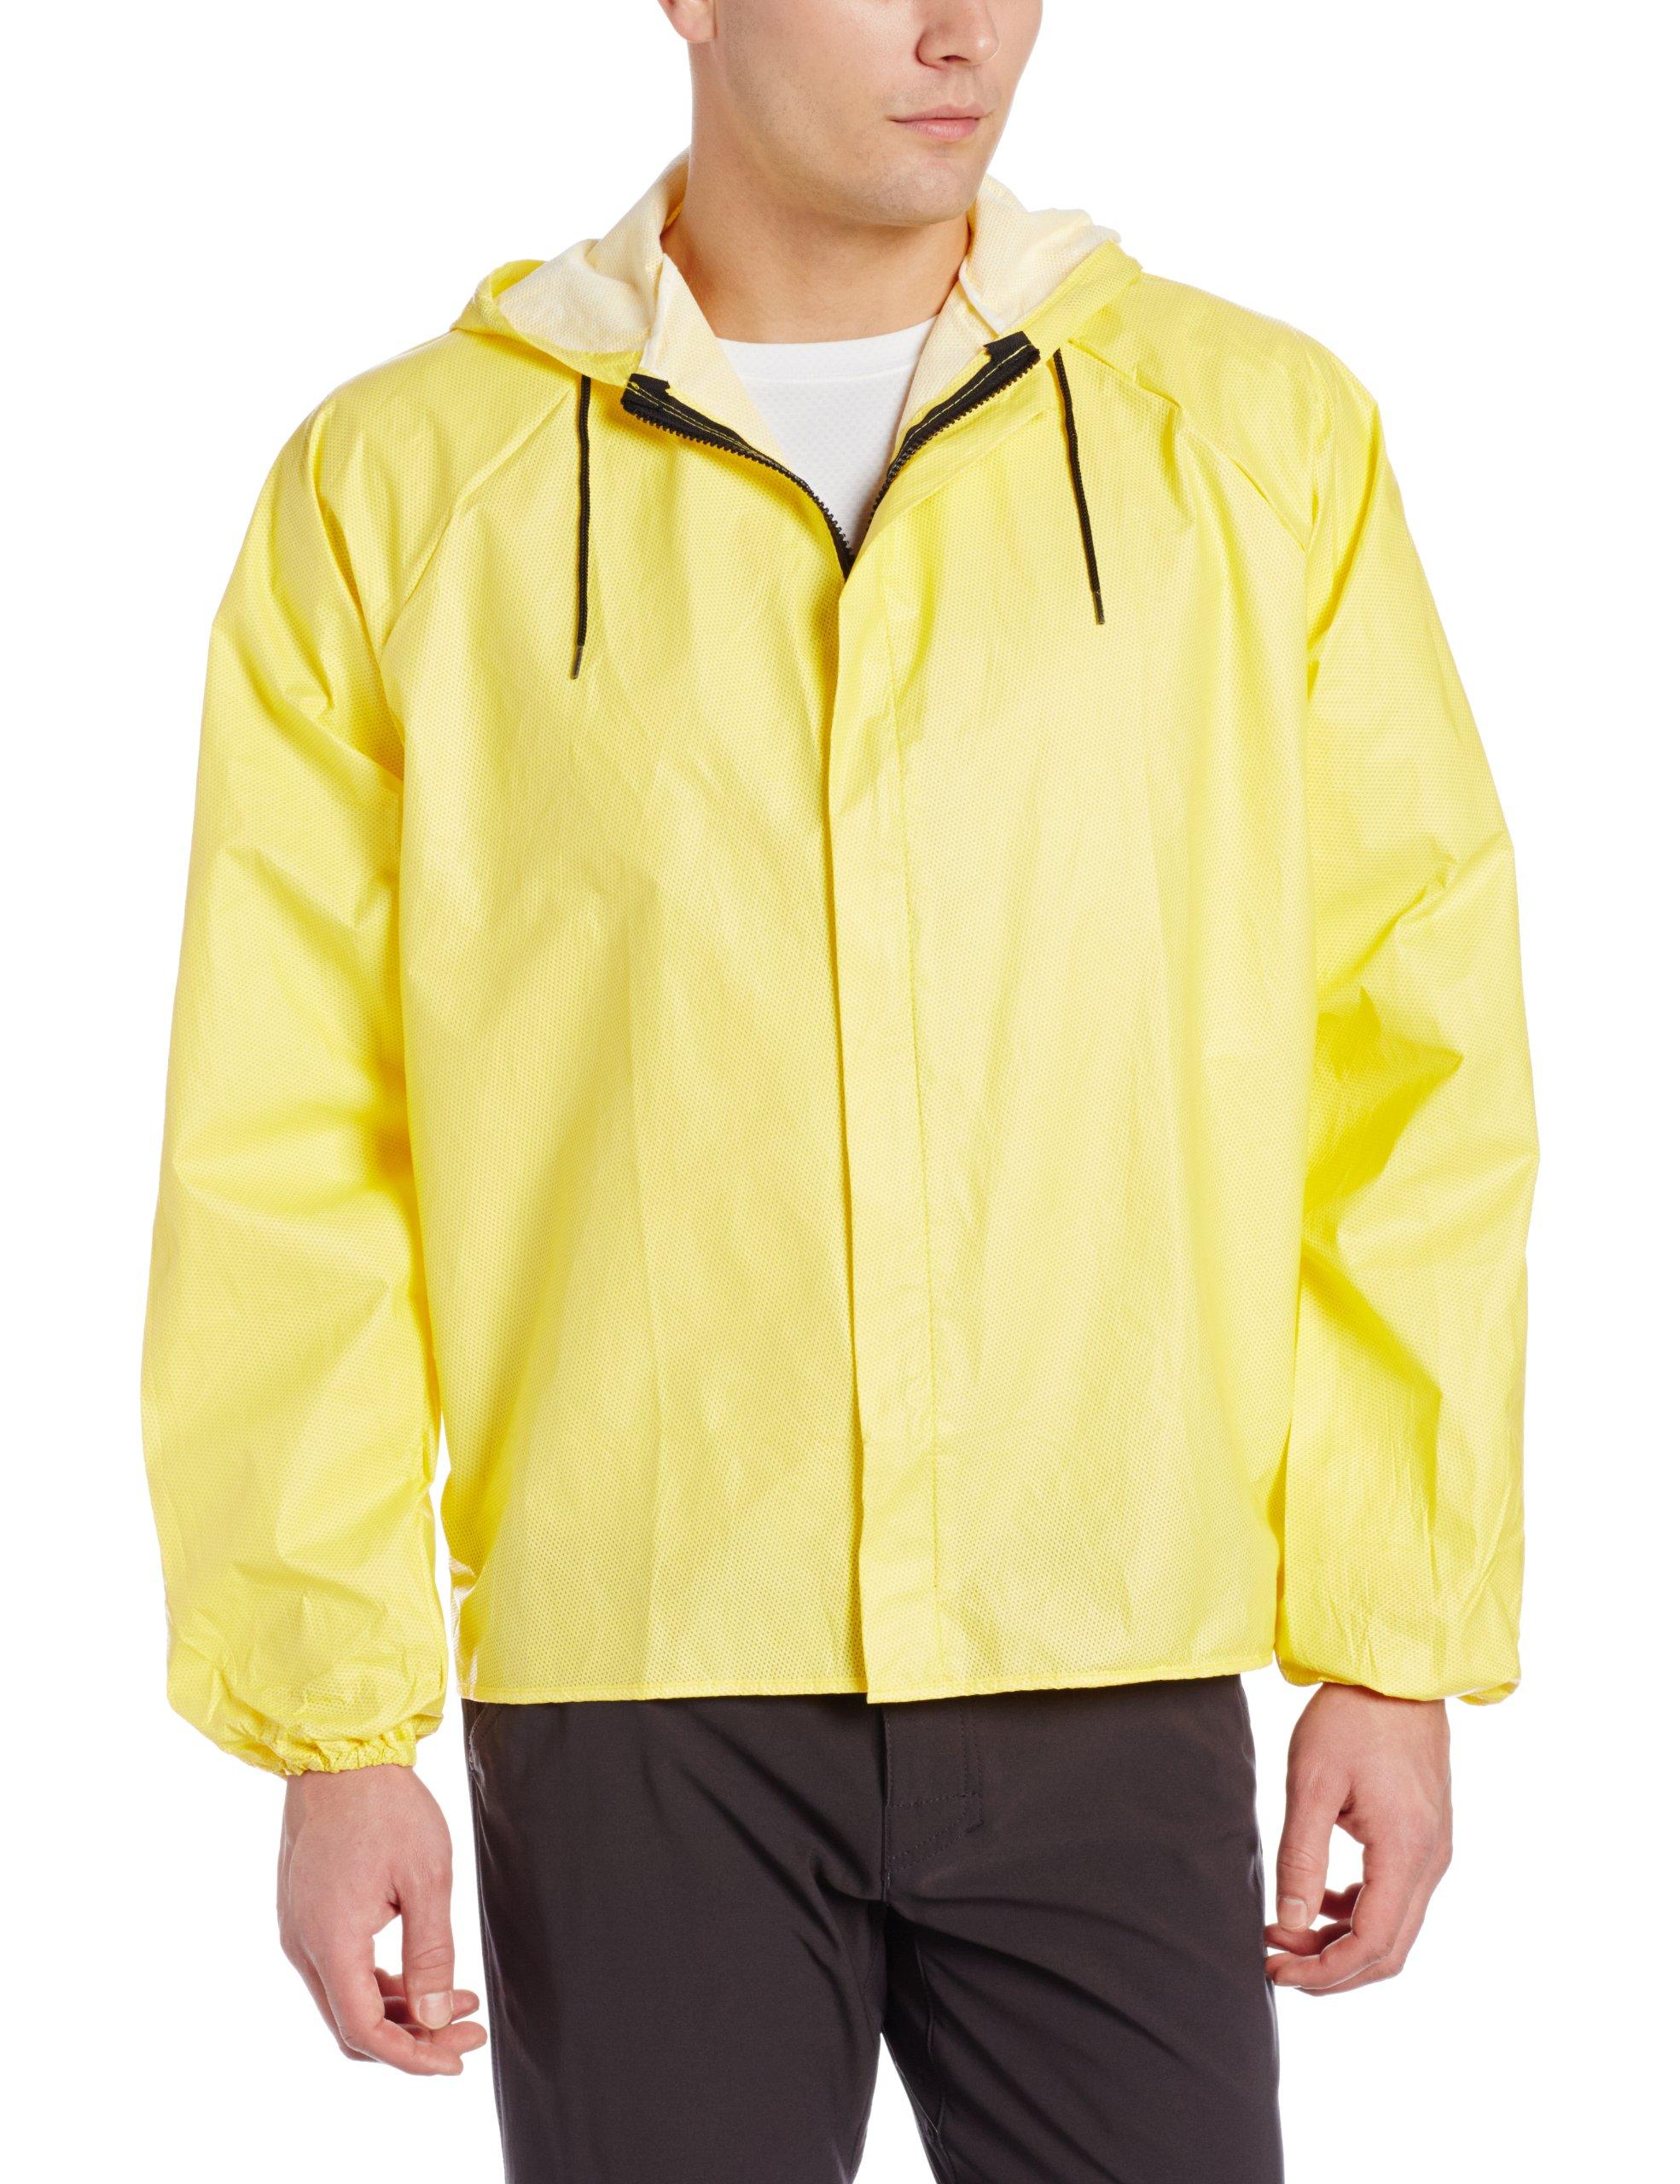 Rainshield O2 Hooded Cycling Rain Jacket, Small, Yellow